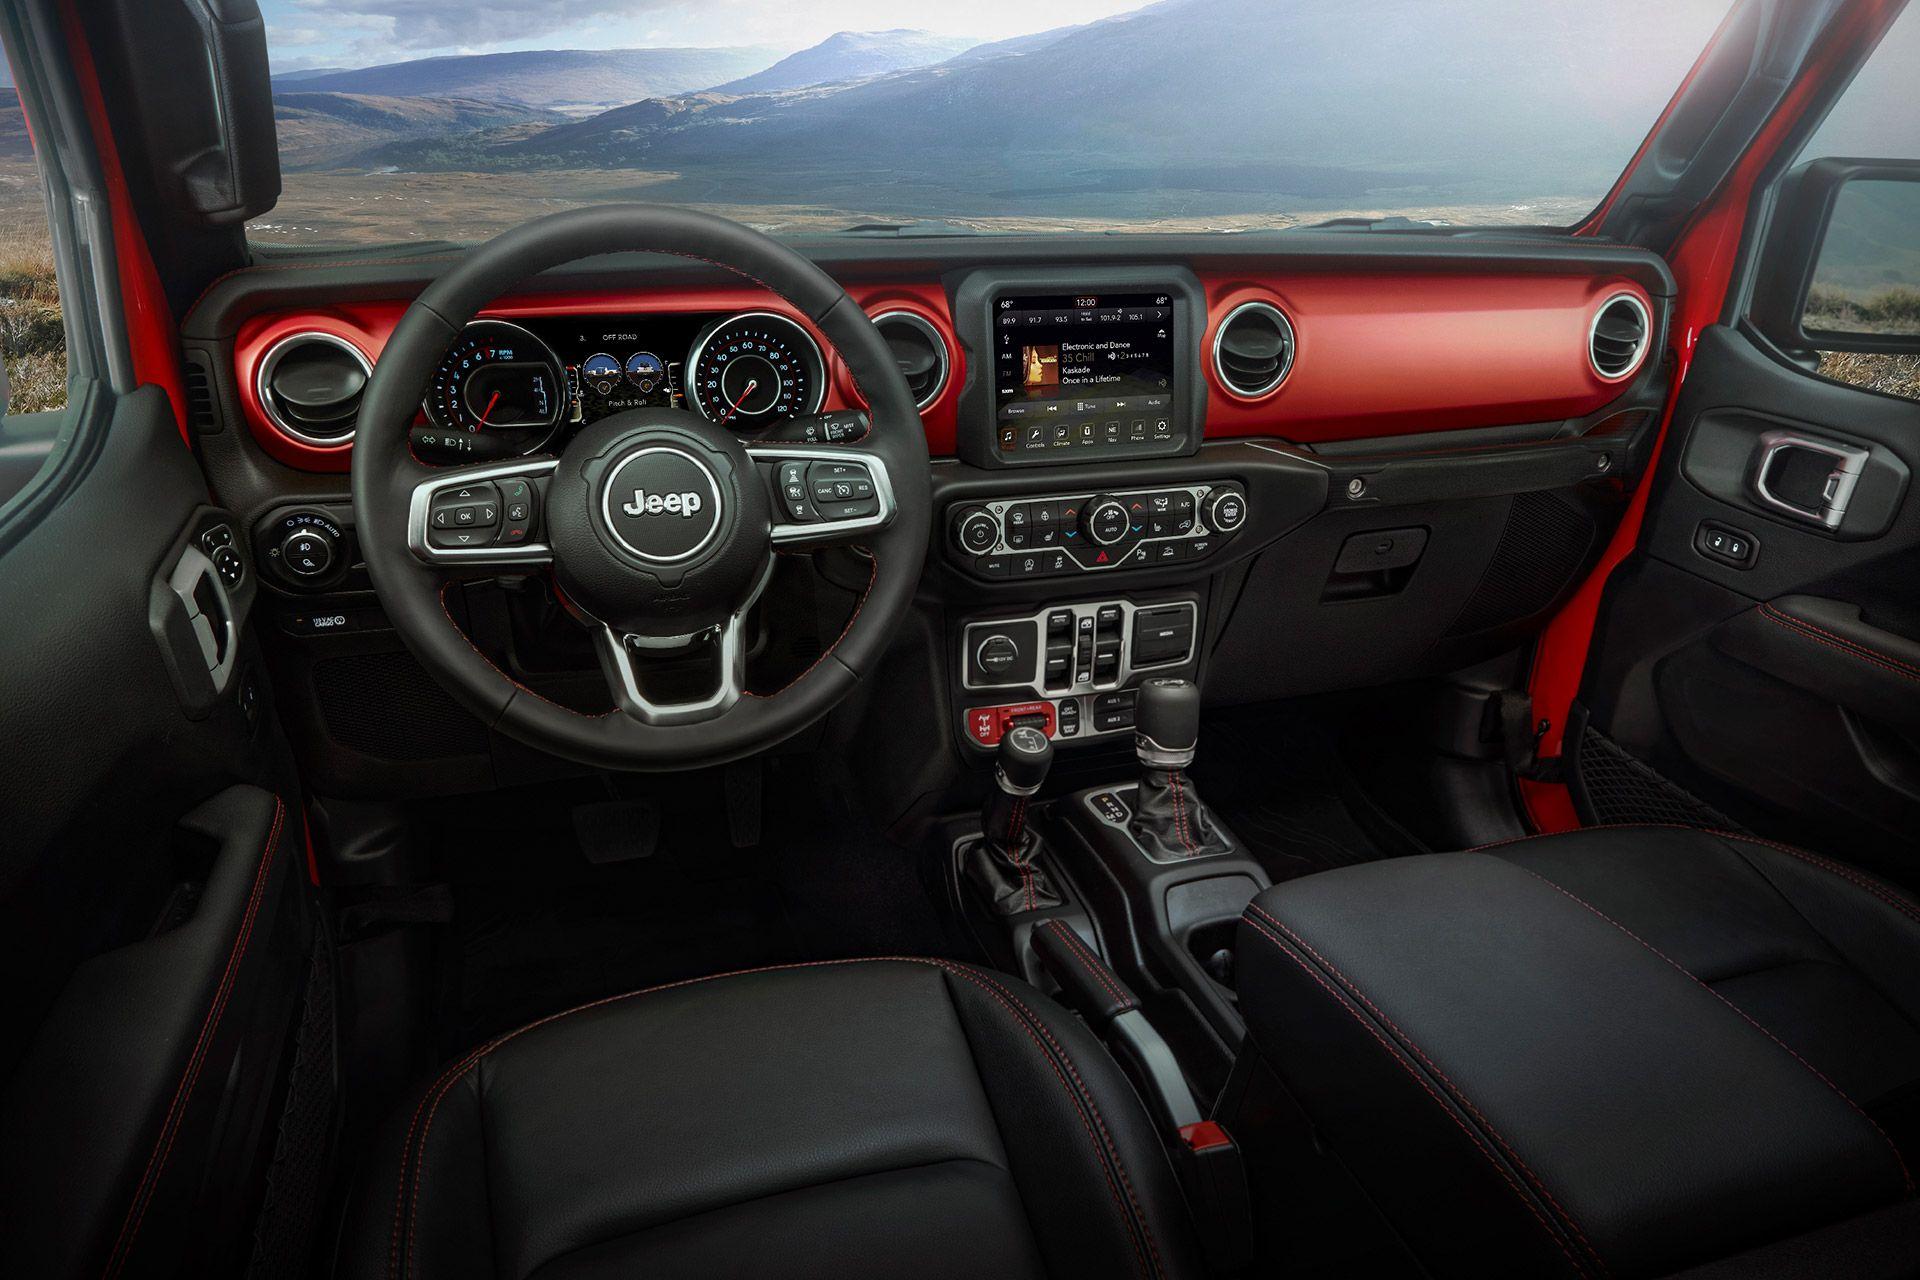 2020 Jeep Gladiator Pickup Truck Jeep Wrangler Rubicon Jeep Wrangler Interior Jeep Interiors